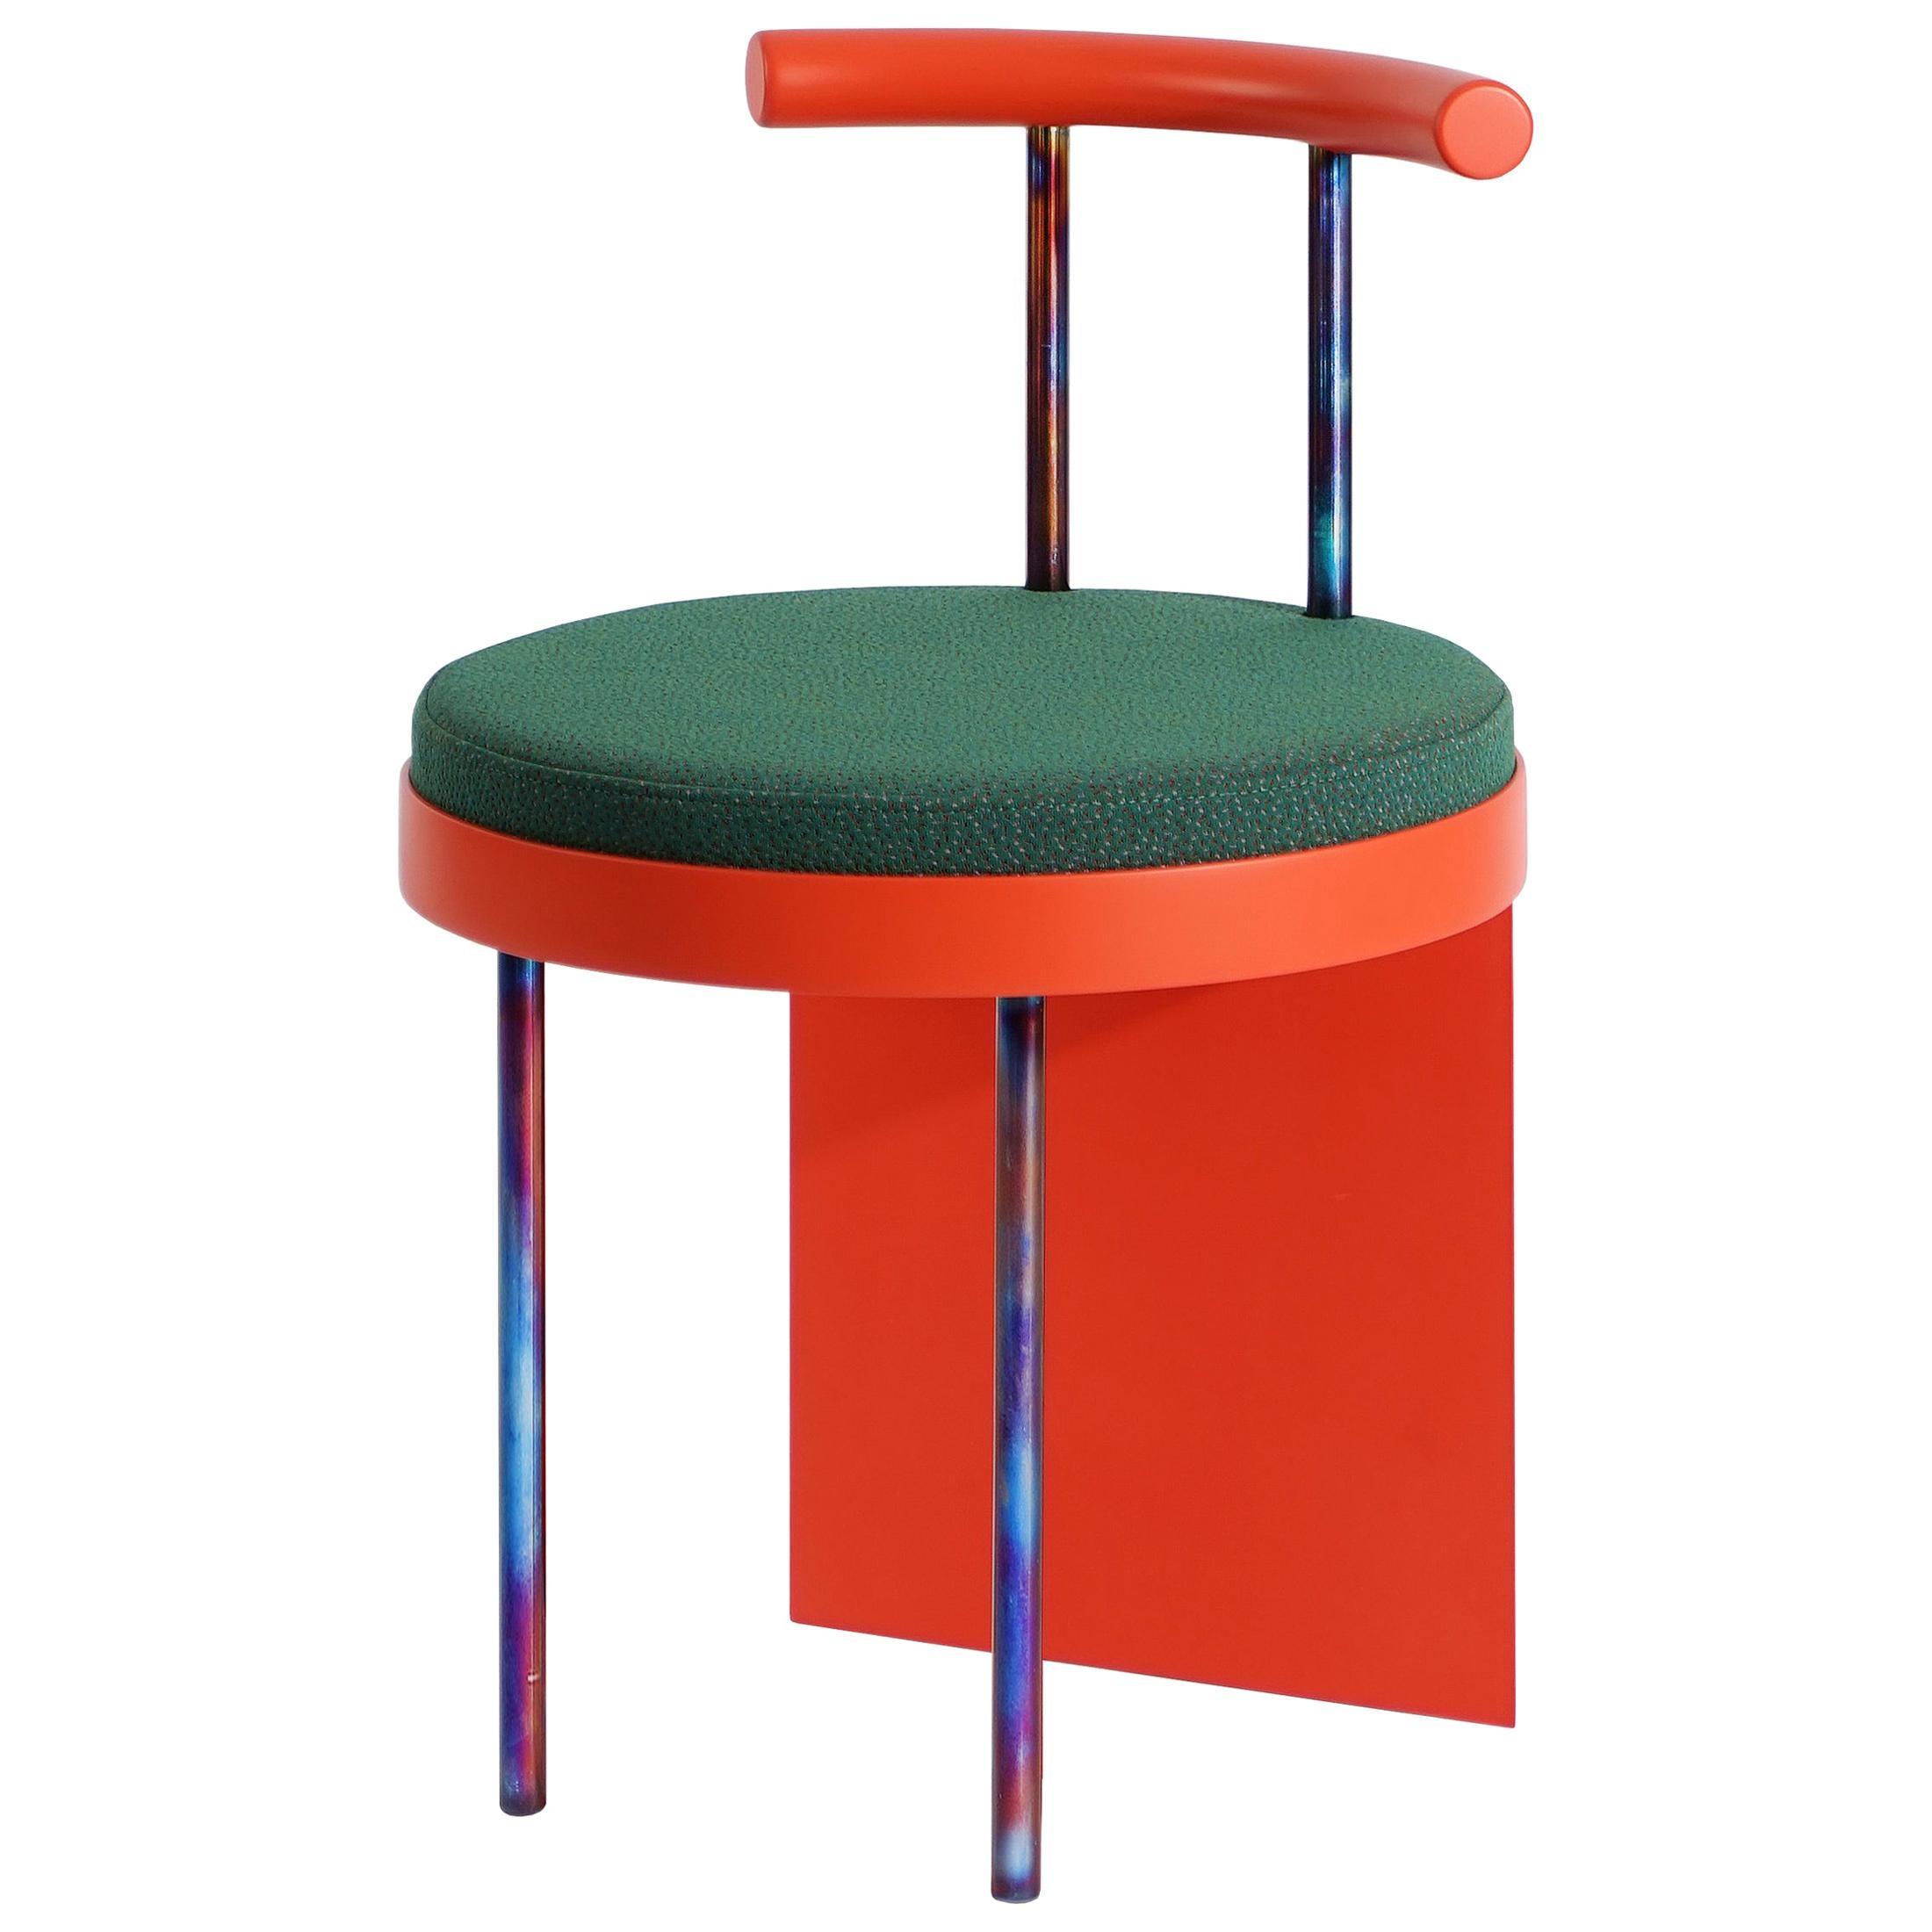 "Modern ""Homy-Chair"" by Supaform"